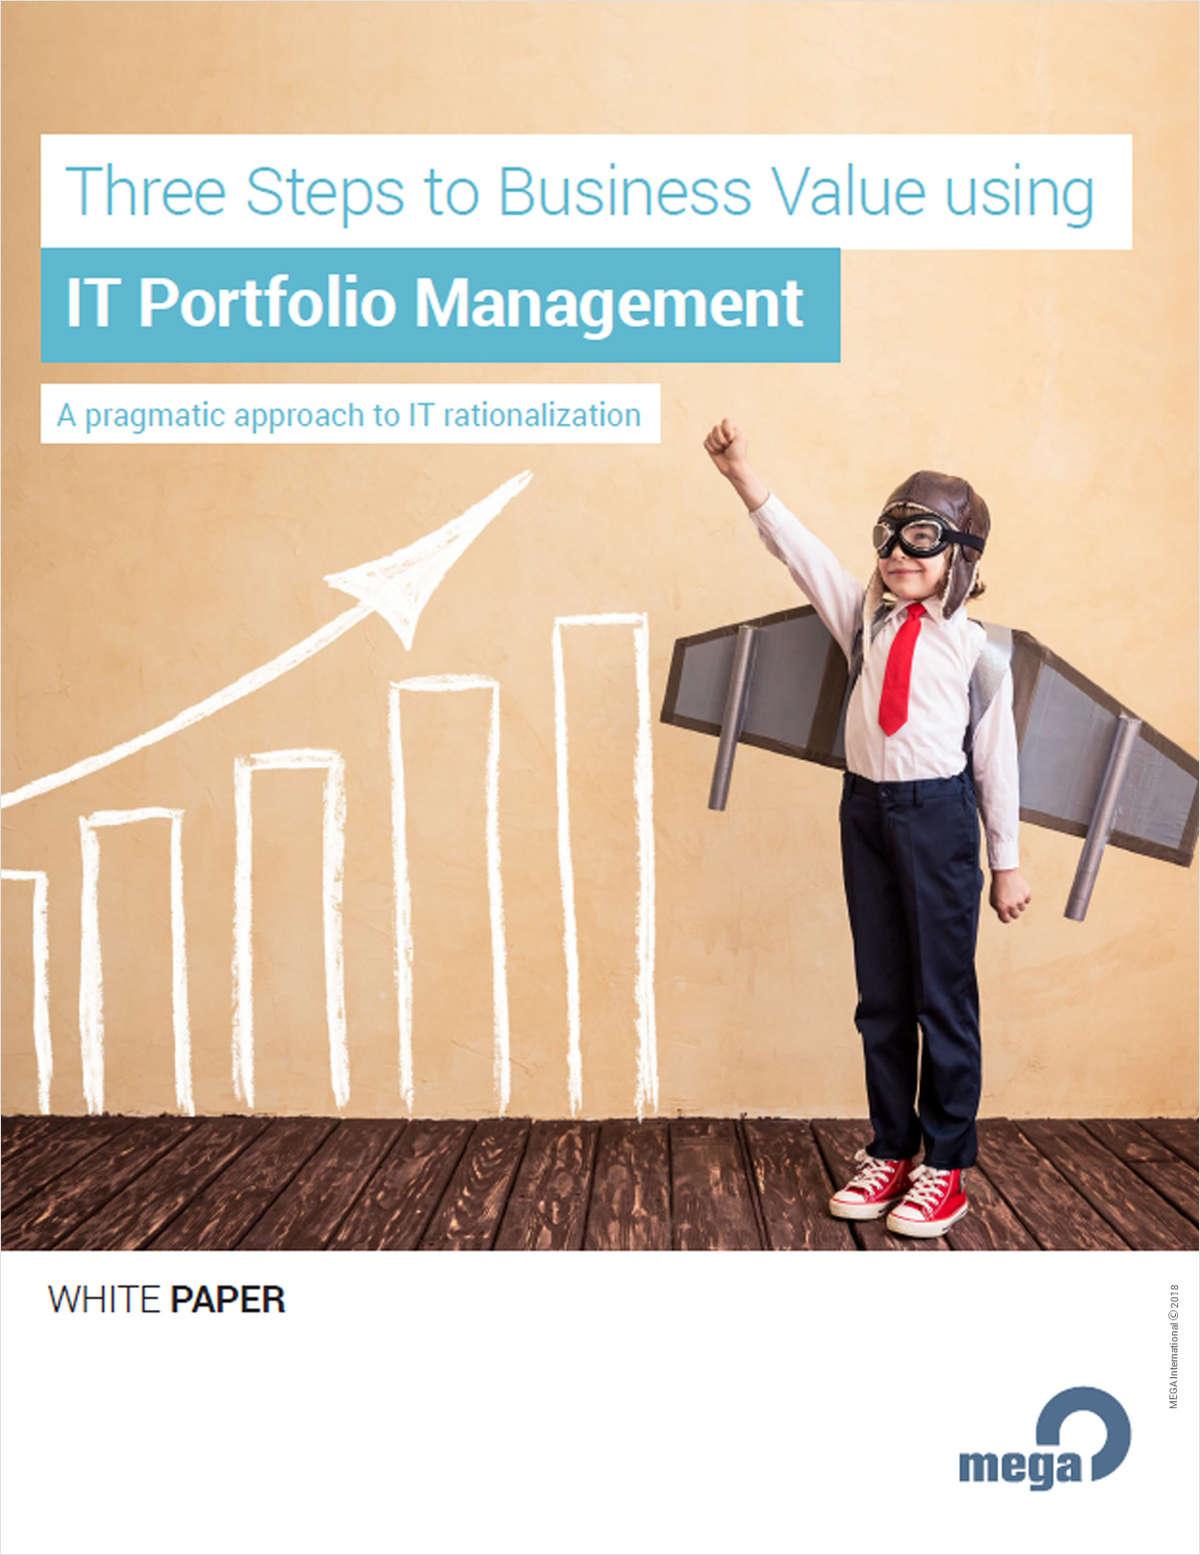 Three Steps to Business Value using IT Portfolio Management